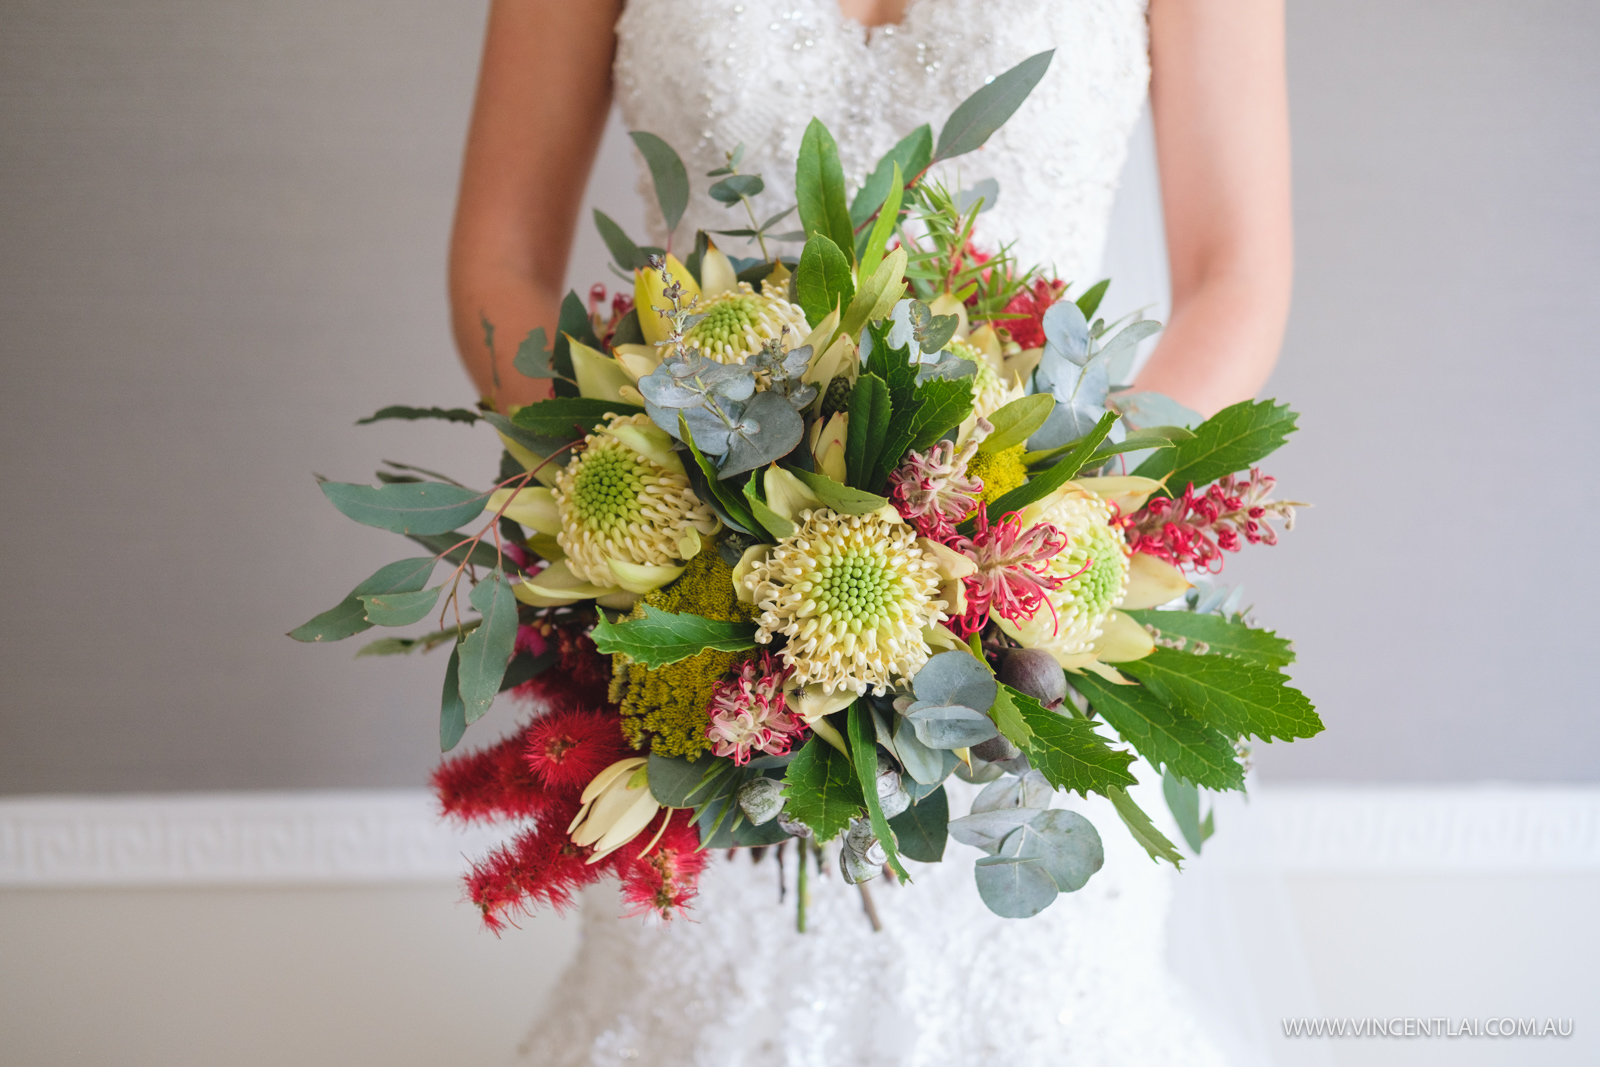 Mosman Art Gallery Wedding Ceremony and Aqua Dining Wedding Reception